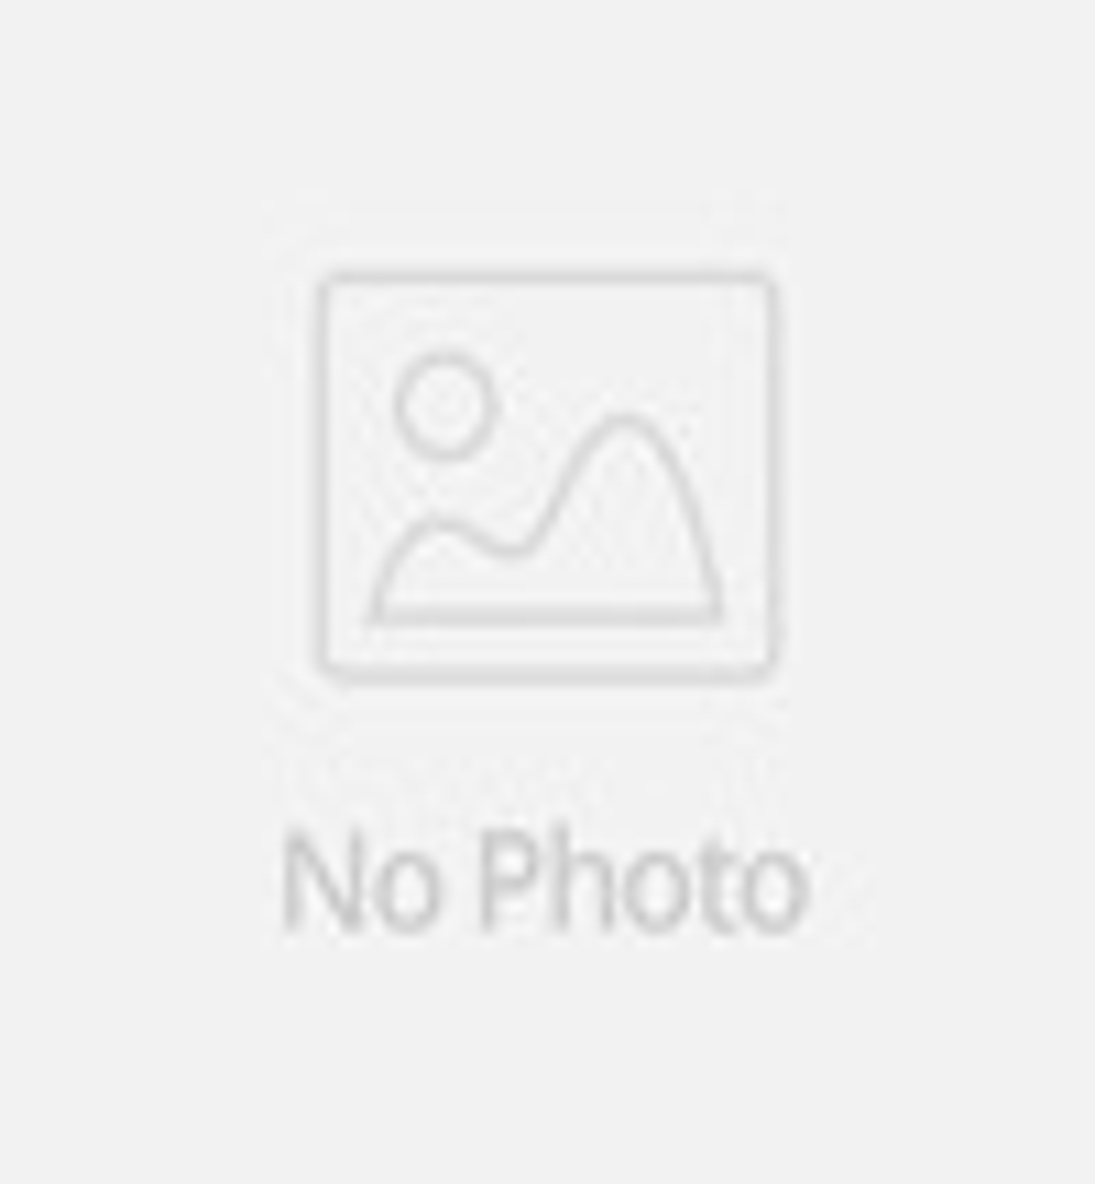 Wholesale Flirt Prom Dresses 27